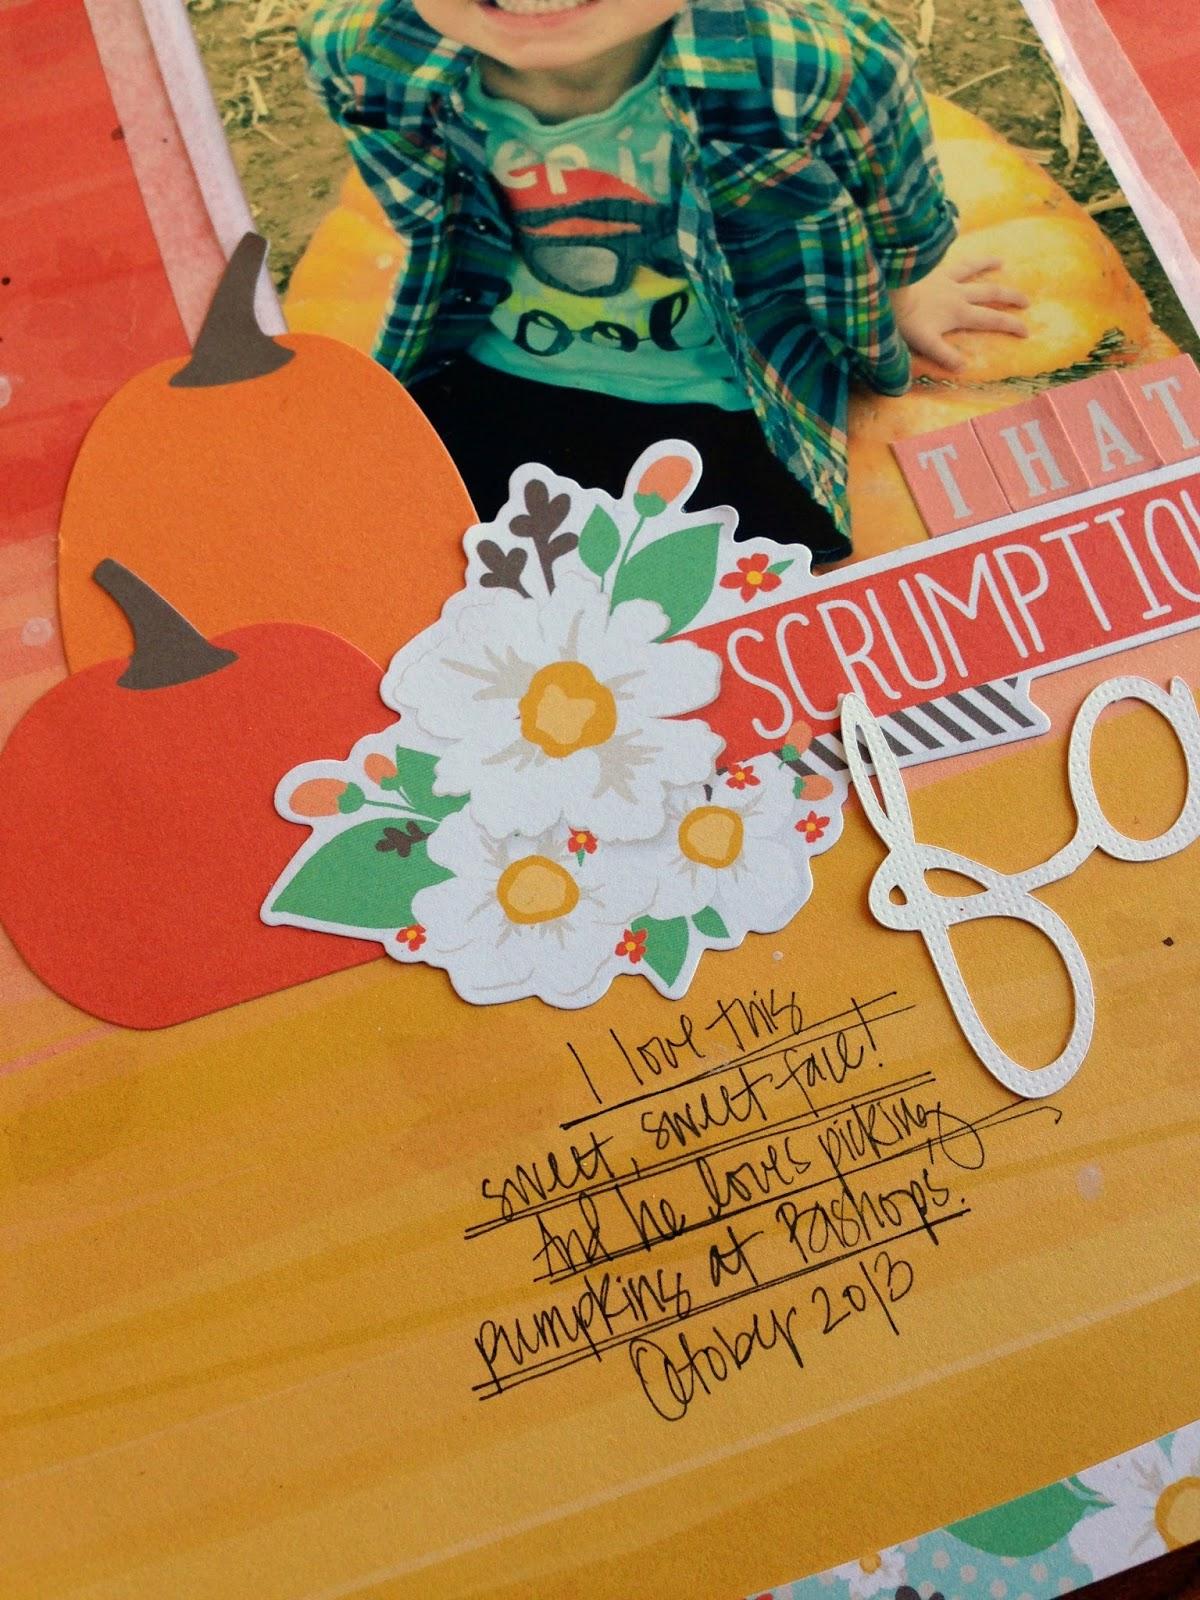 Tessa Buys Chickaniddy Crafts Fall Layout close-up